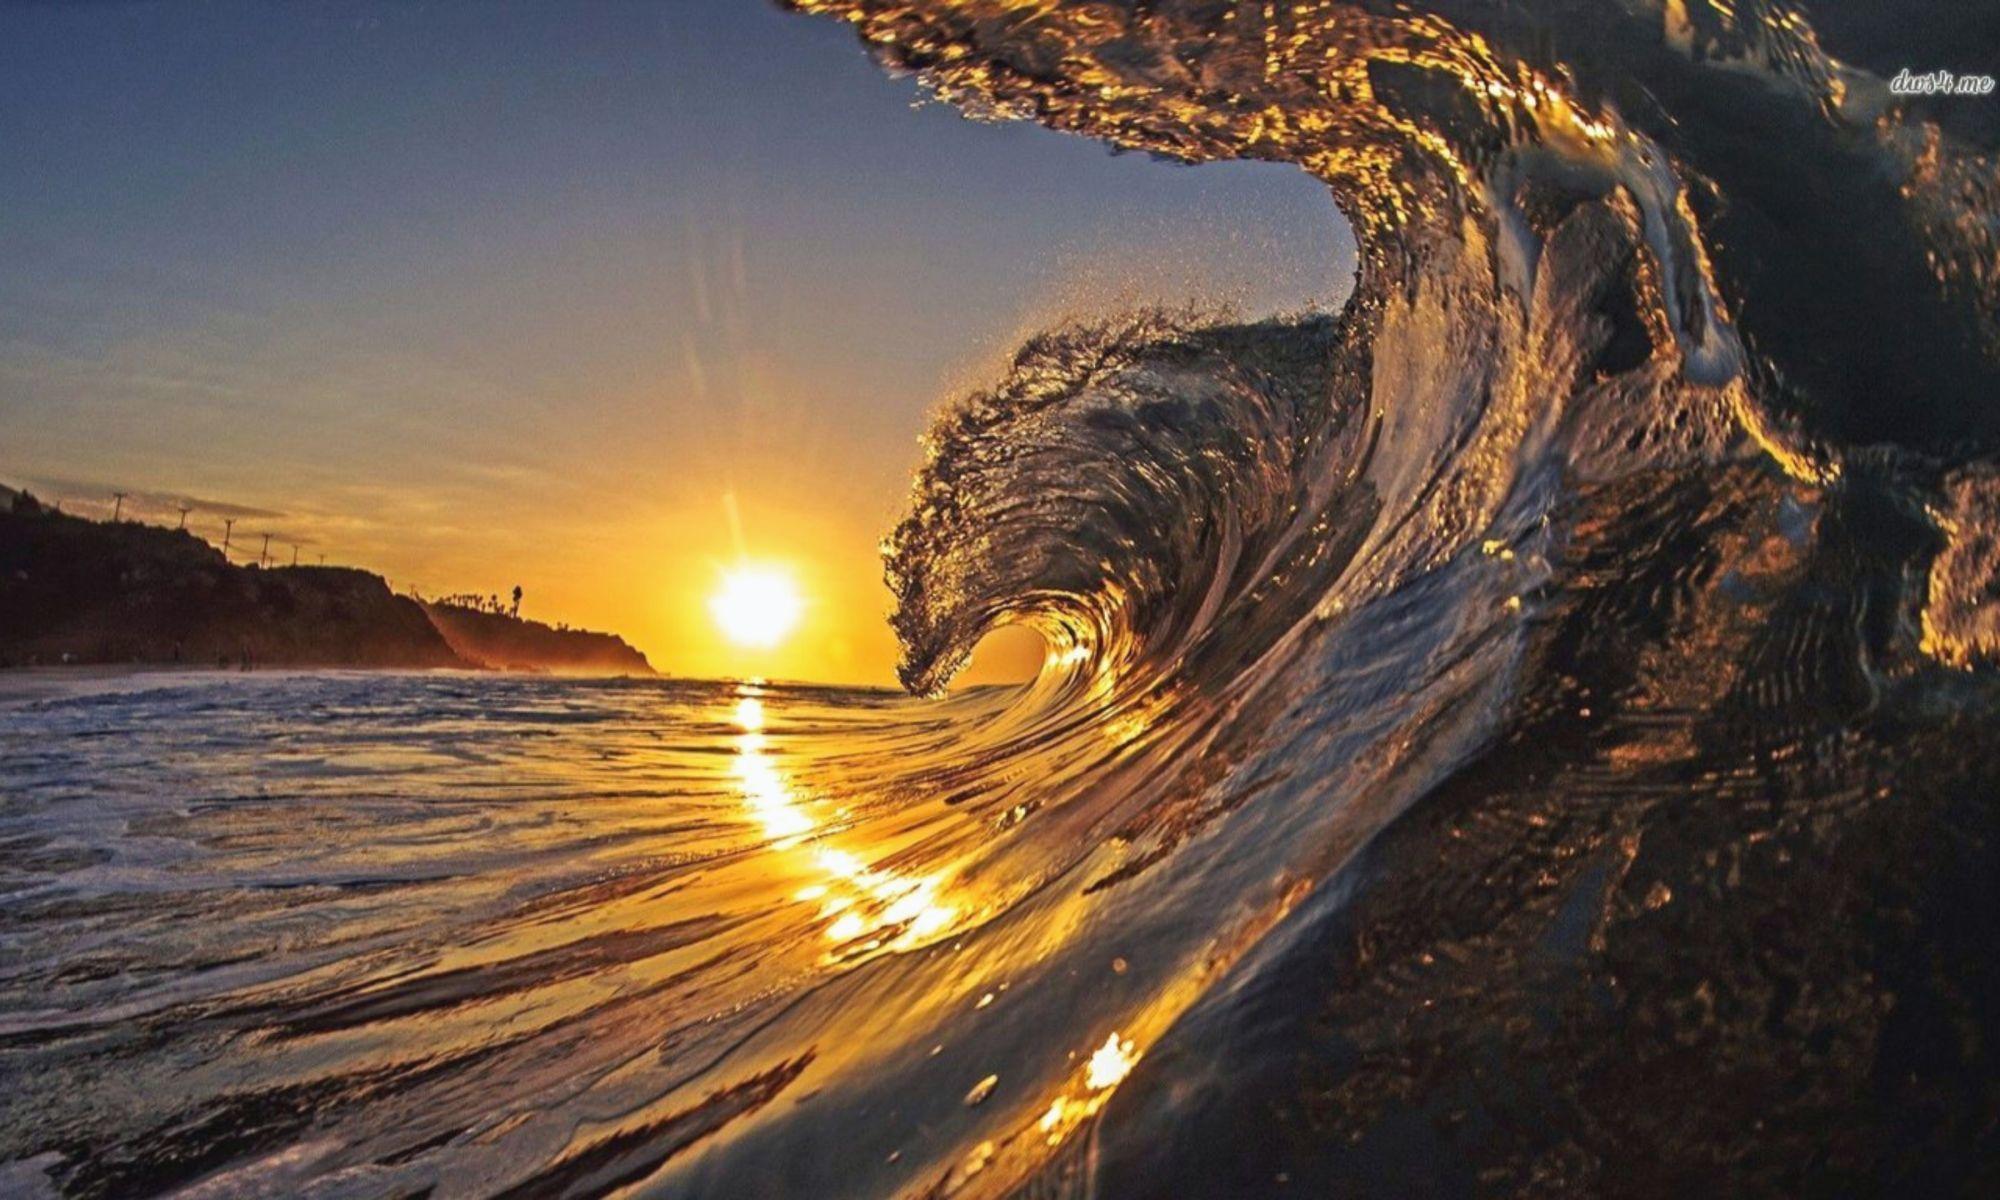 Beautiful Waves Wallpaper Hdartwallpaper Com Waves Wallpaper Sunset Wallpaper Sunset Waves